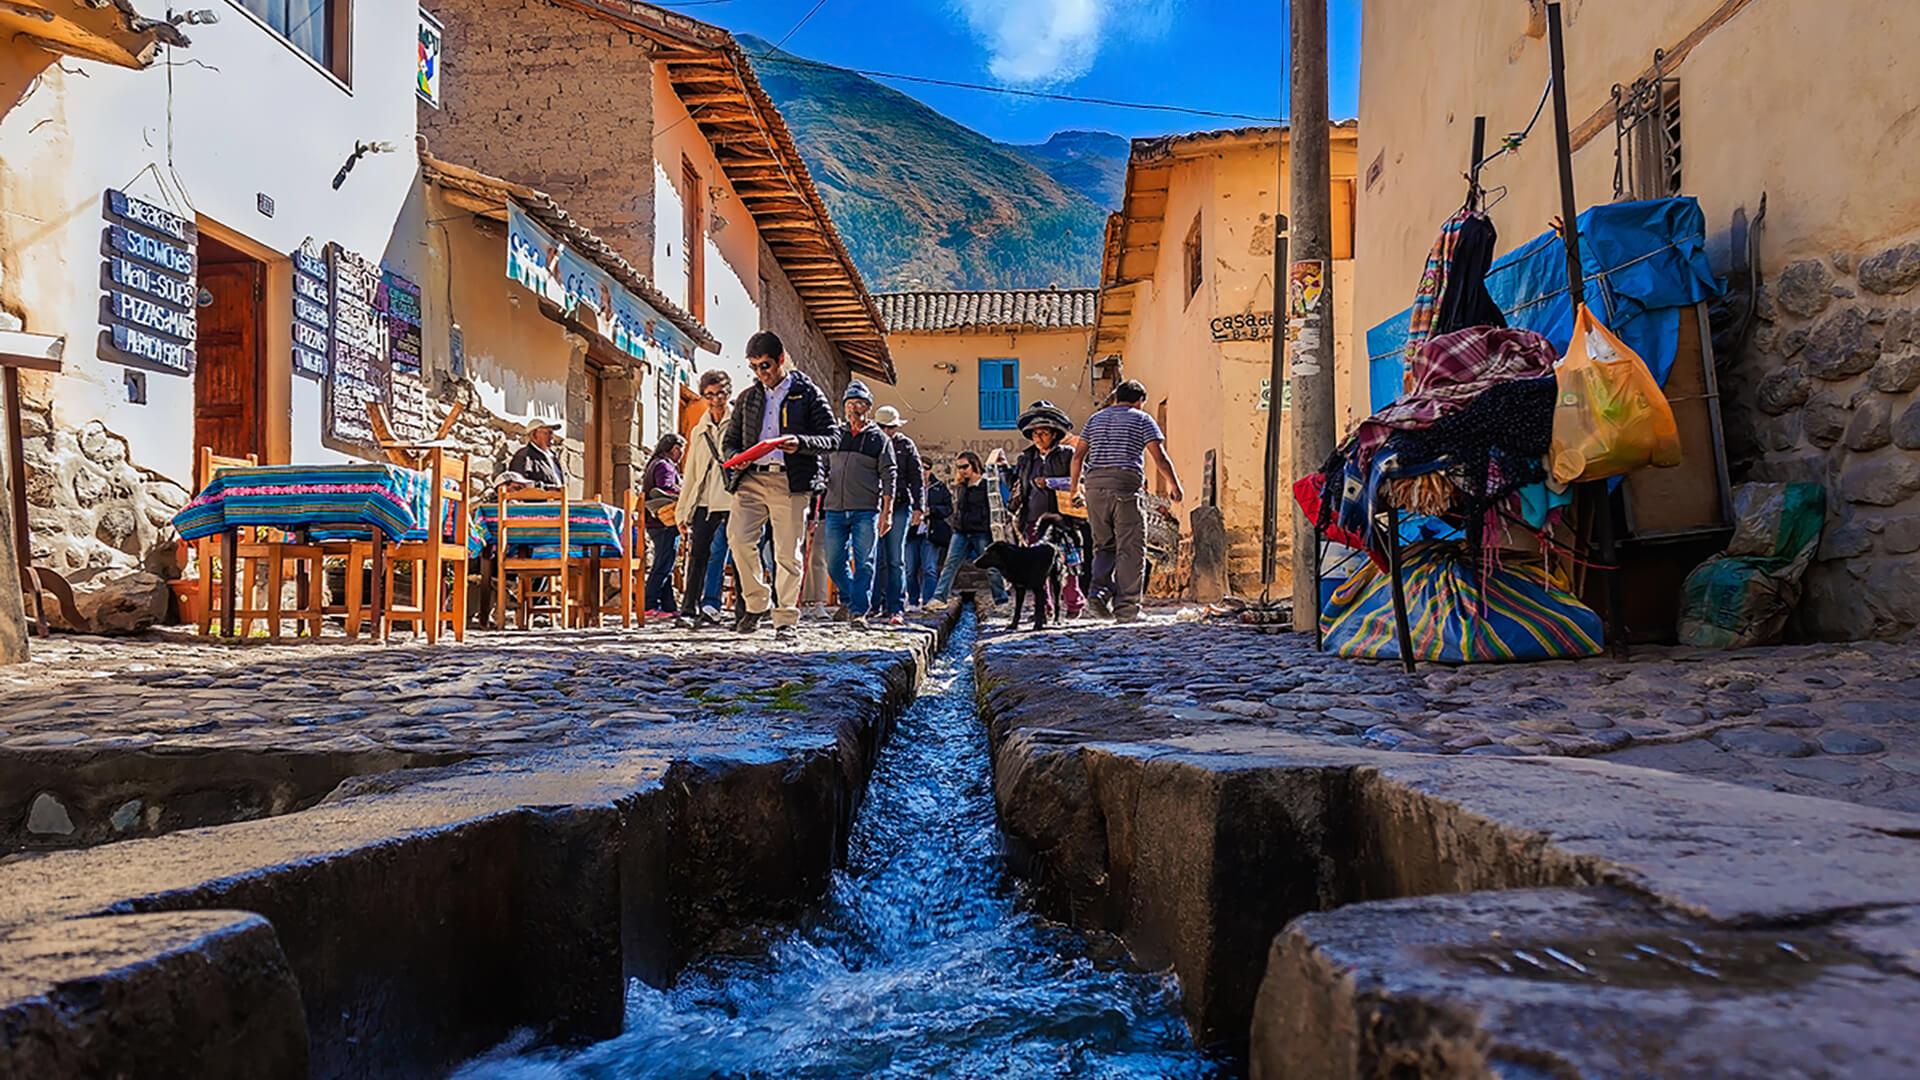 Charmant village de Ollantaytambo au Pérou